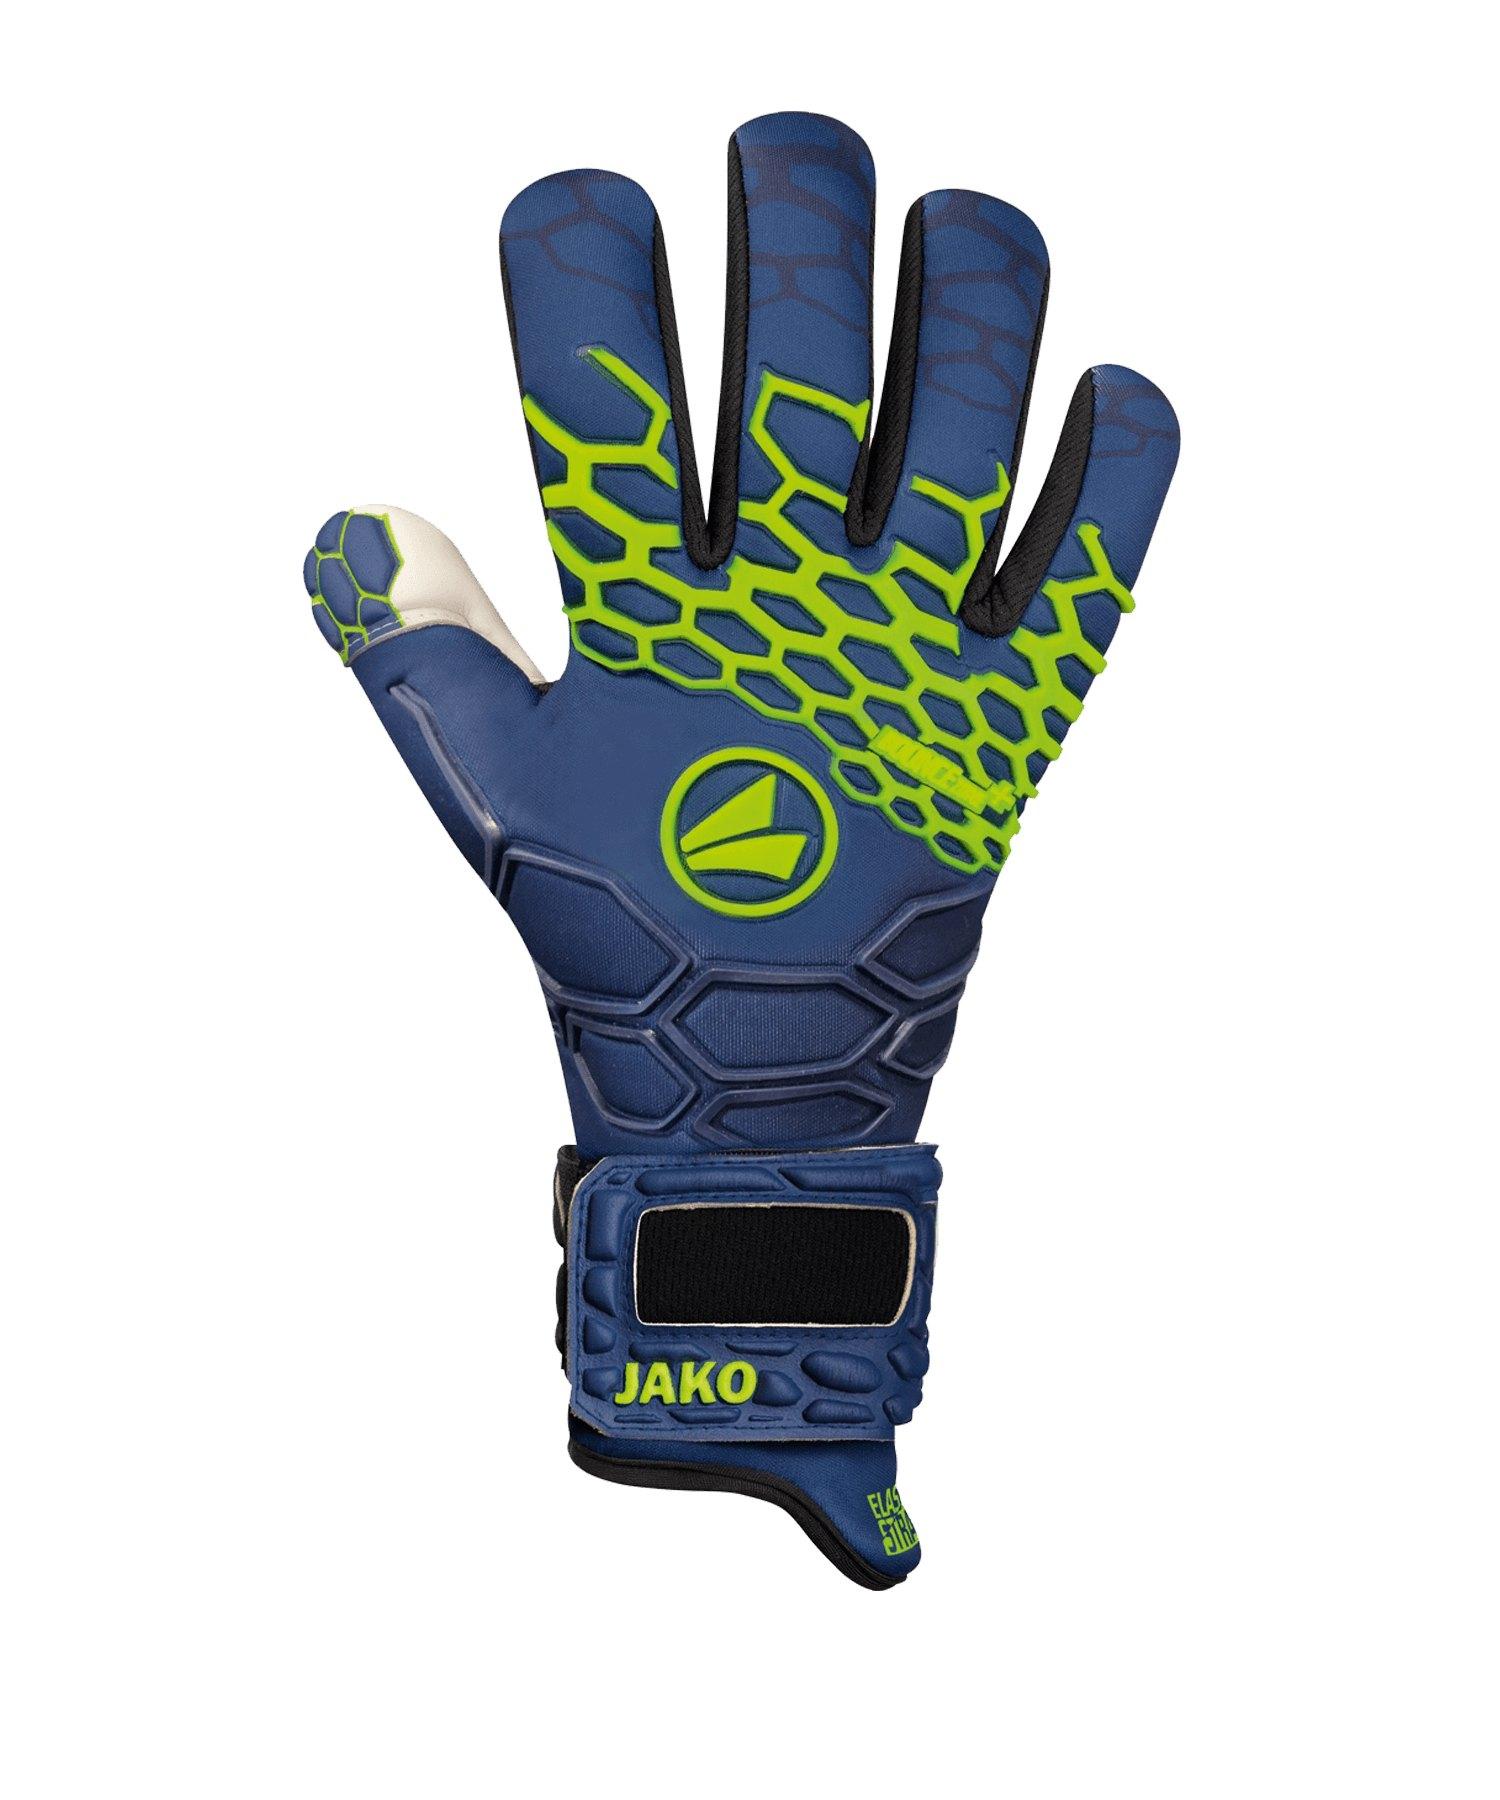 JAKO TW-Handschuh Prestige GIGA Negative Cut F09 - blau